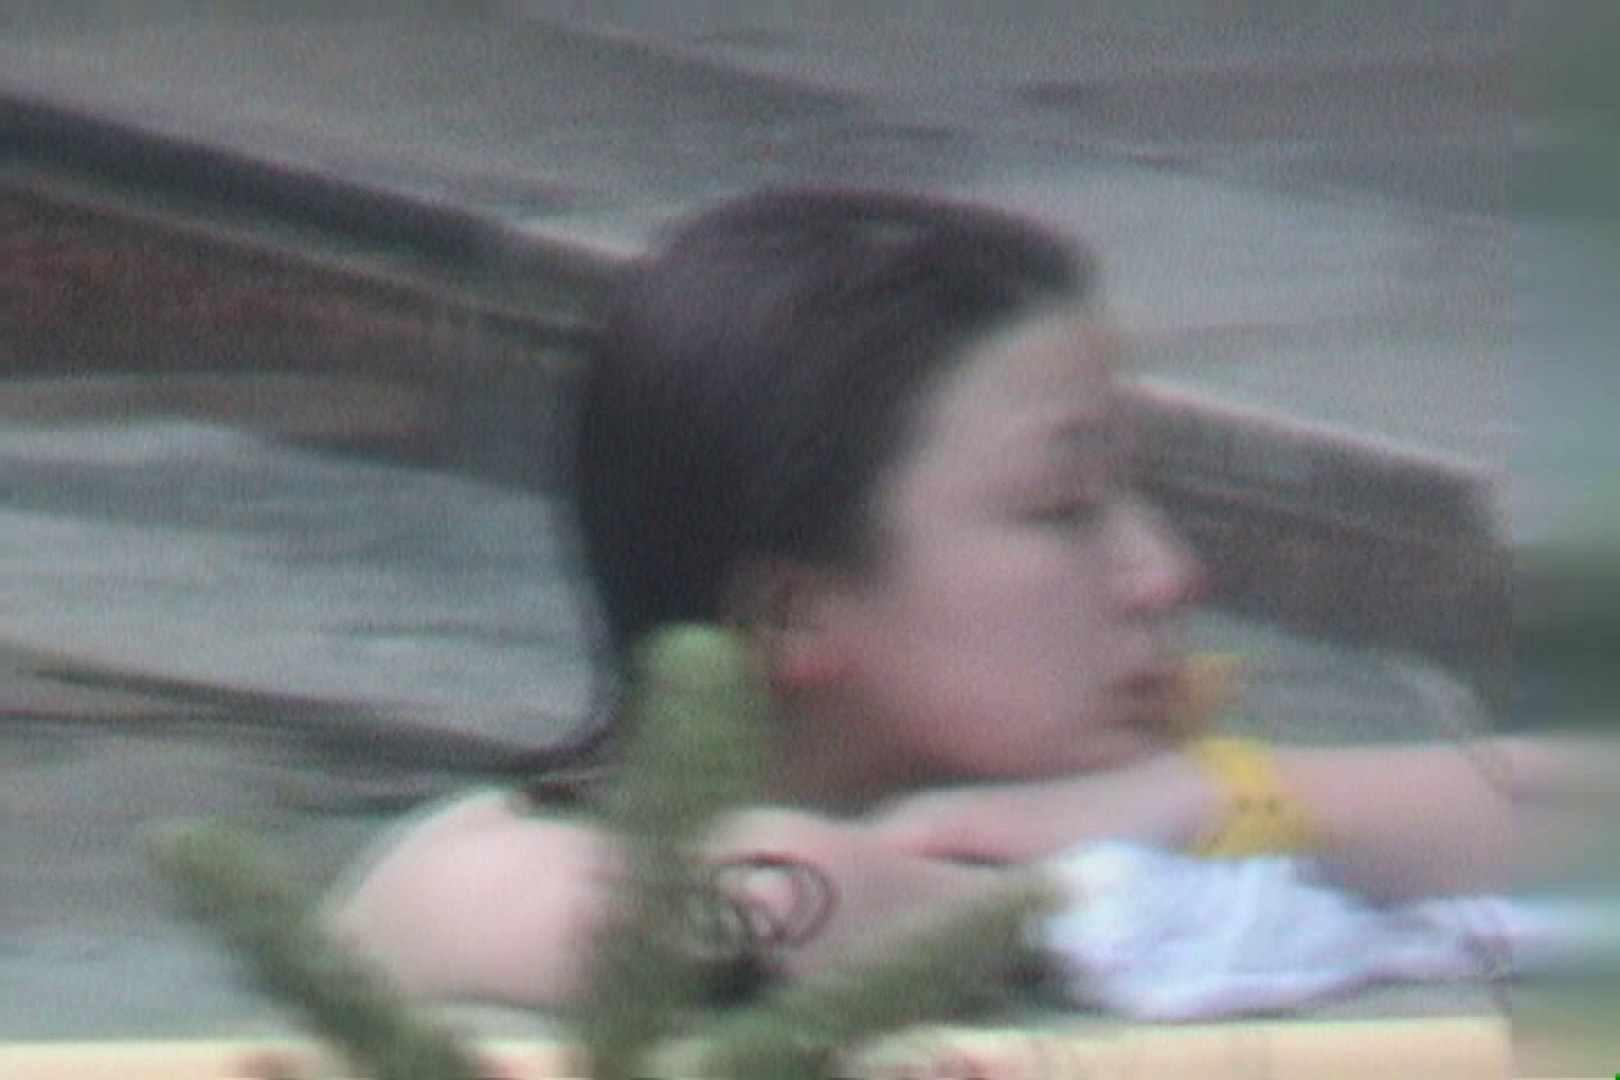 Aquaな露天風呂Vol.599 露天 | HなOL  104pic 14